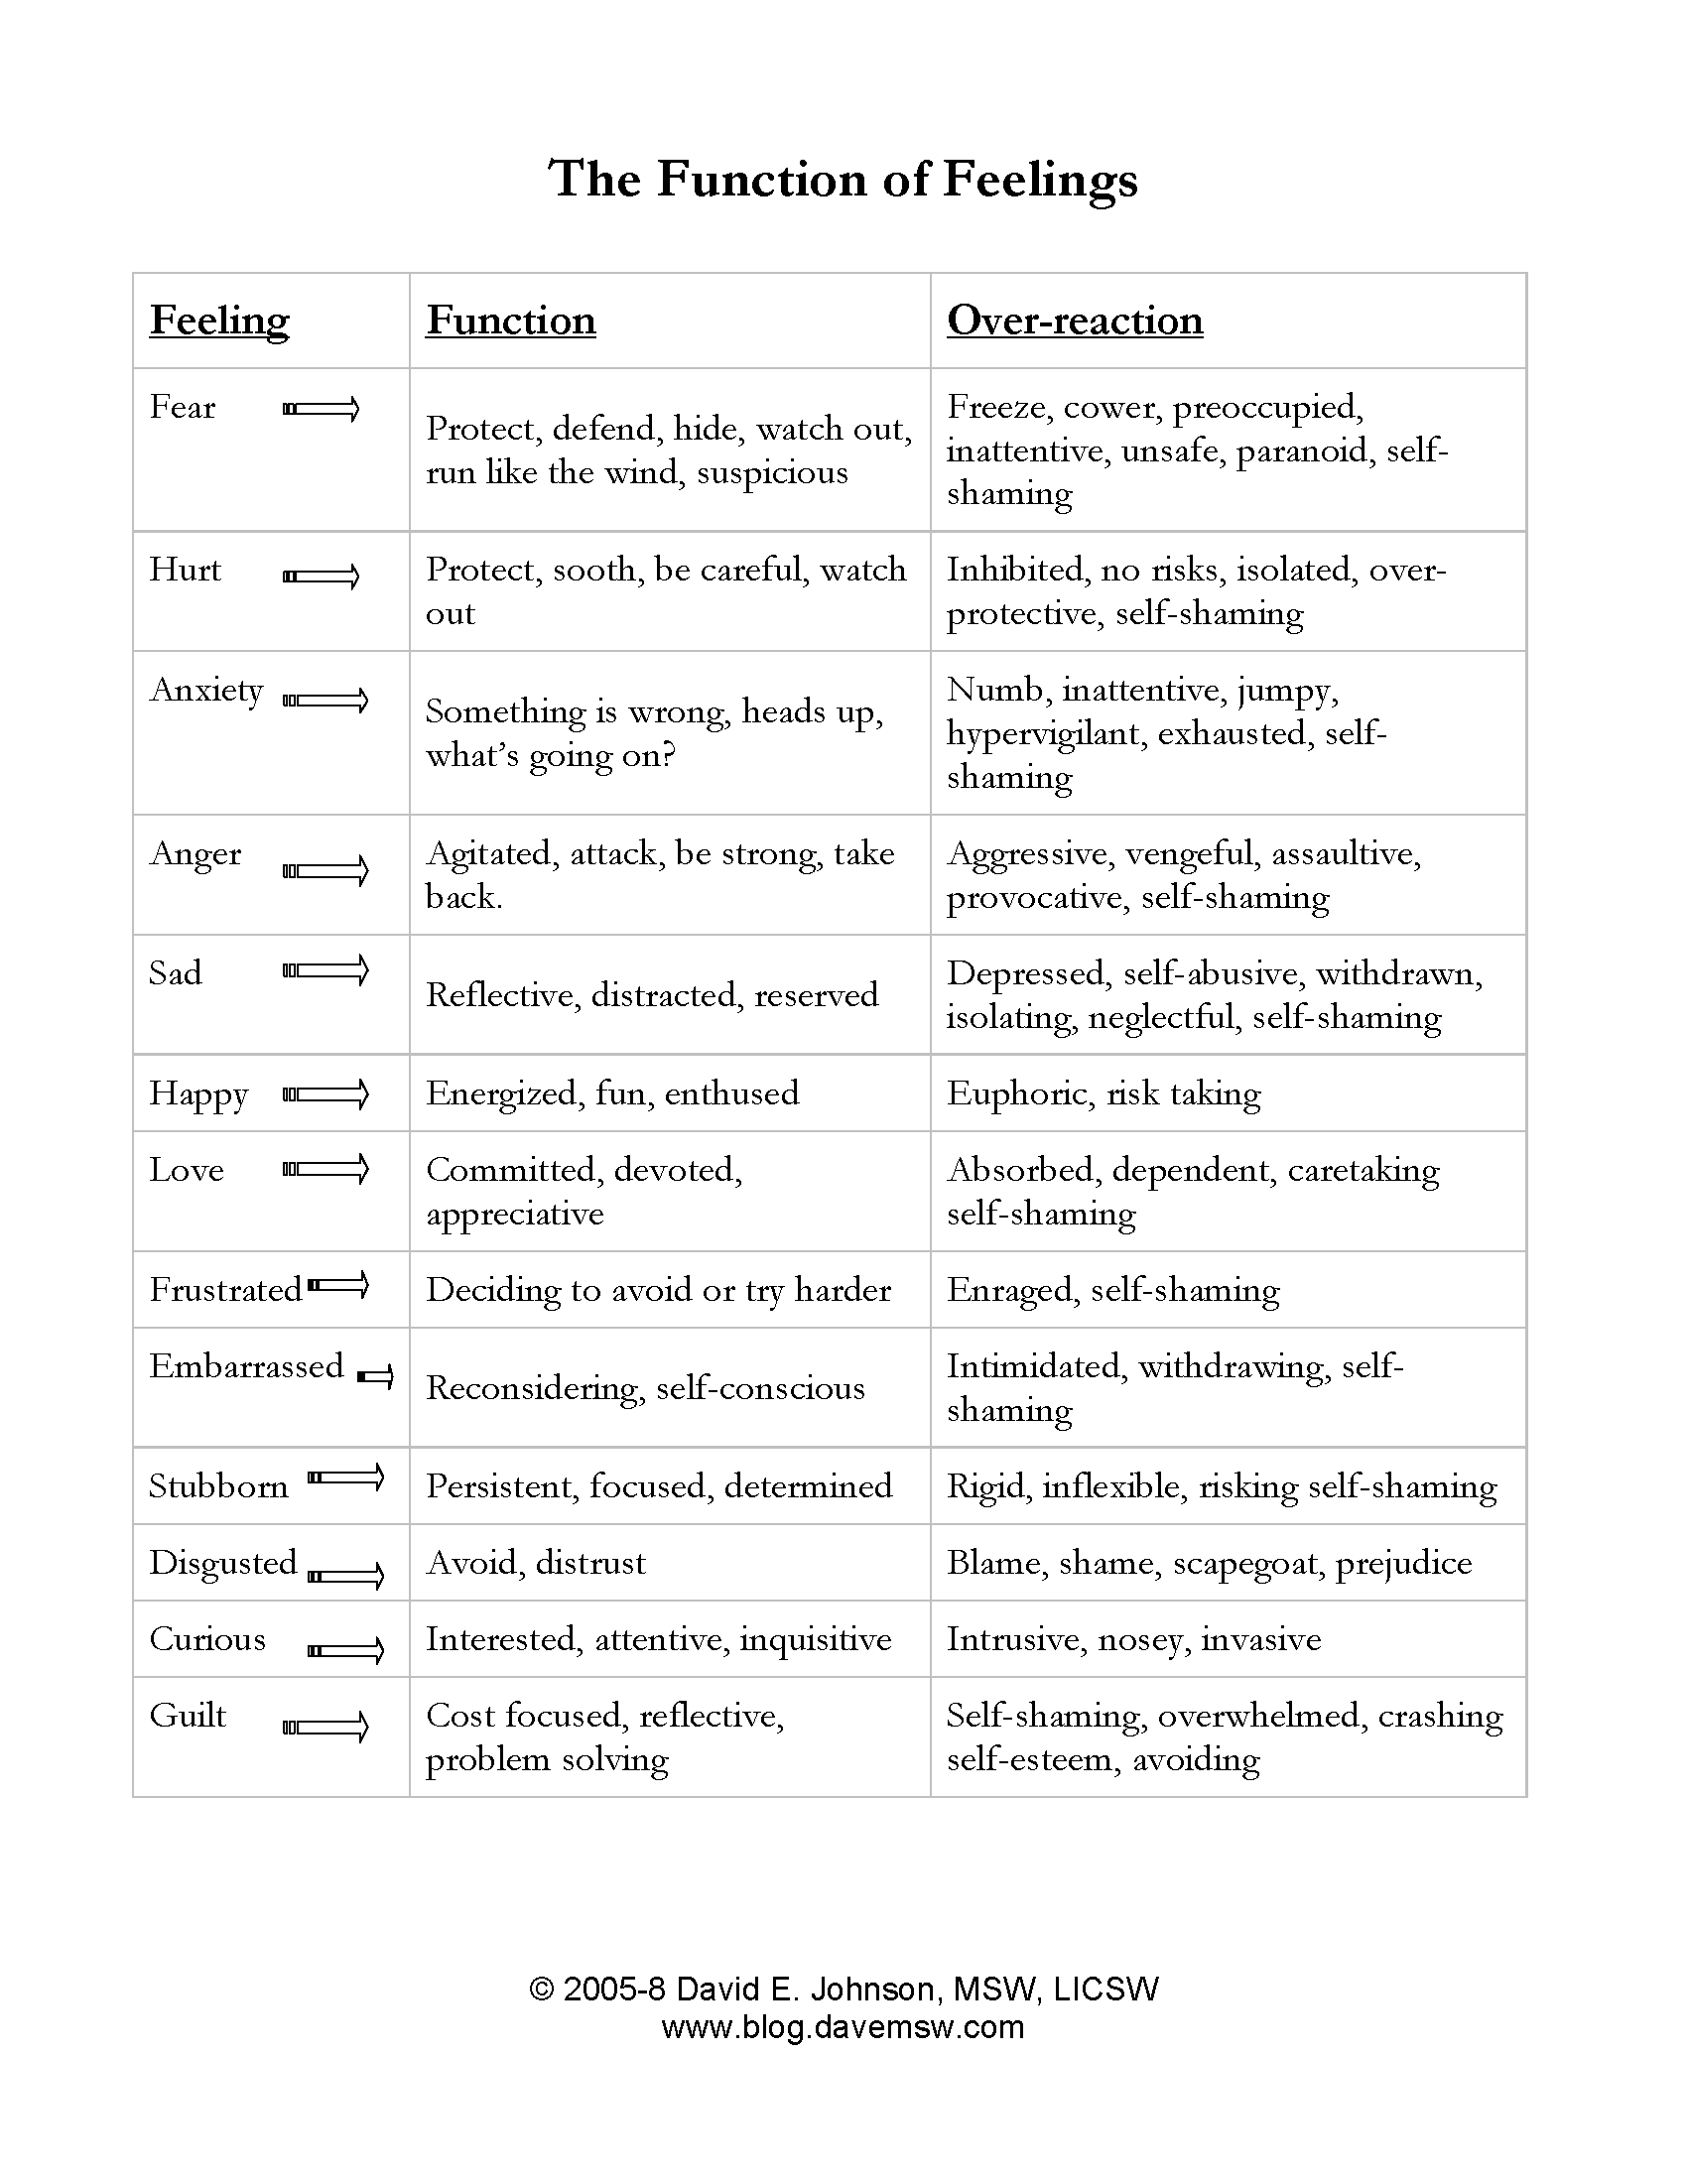 The Function Of Feelings